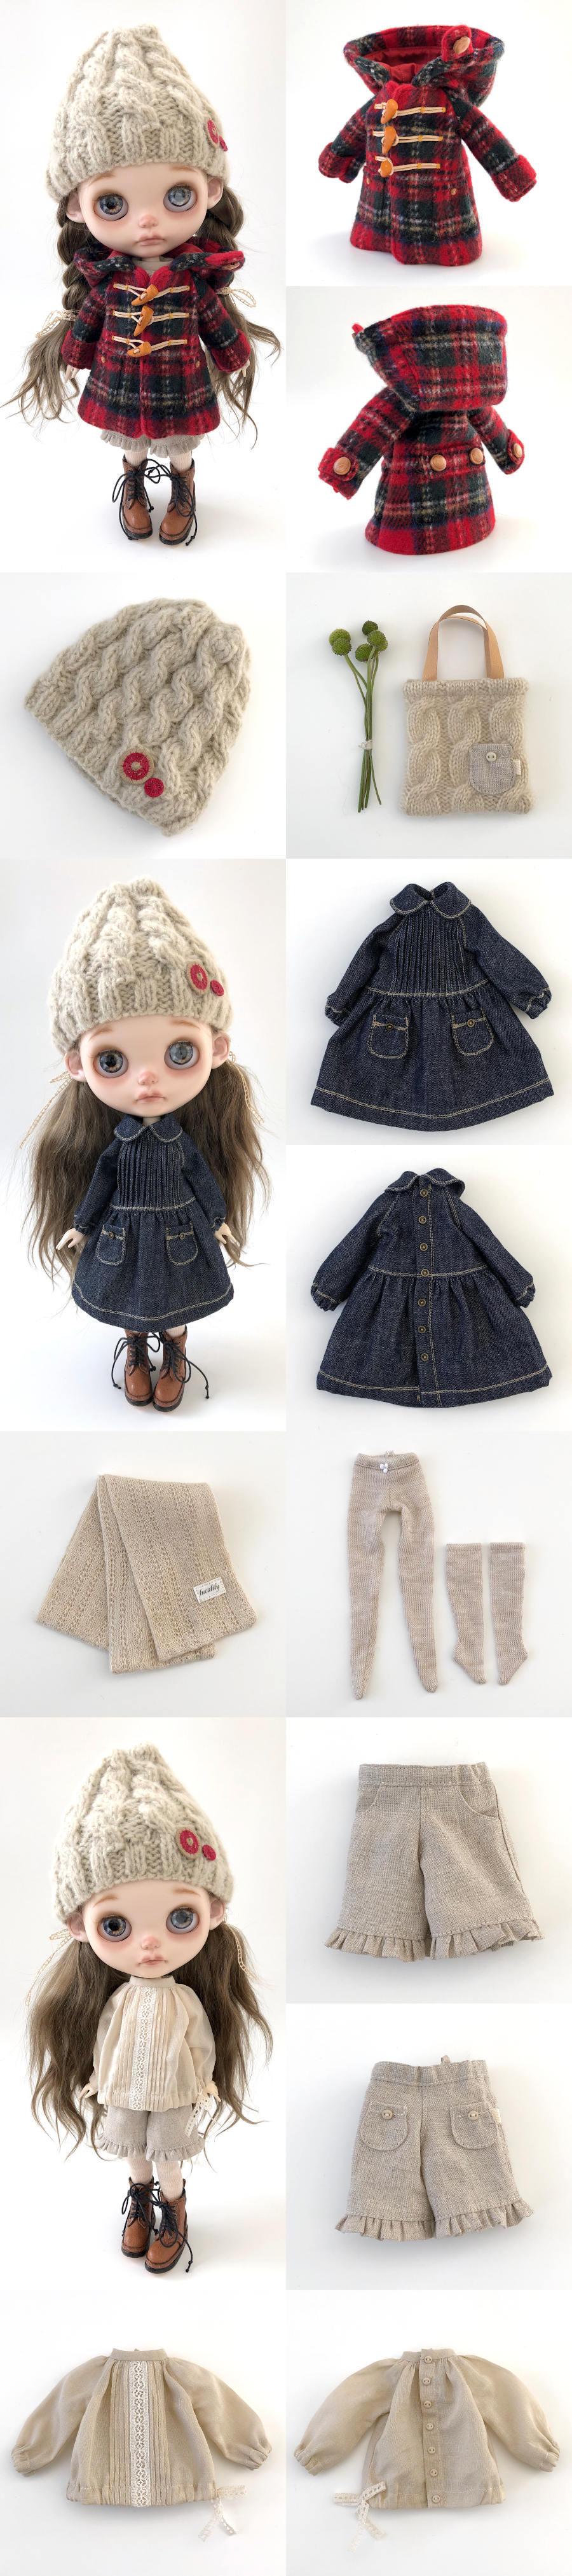 *lucalily * dolls clothes* Stewart Royal Duffle Coat Set *_d0217189_22585747.jpeg